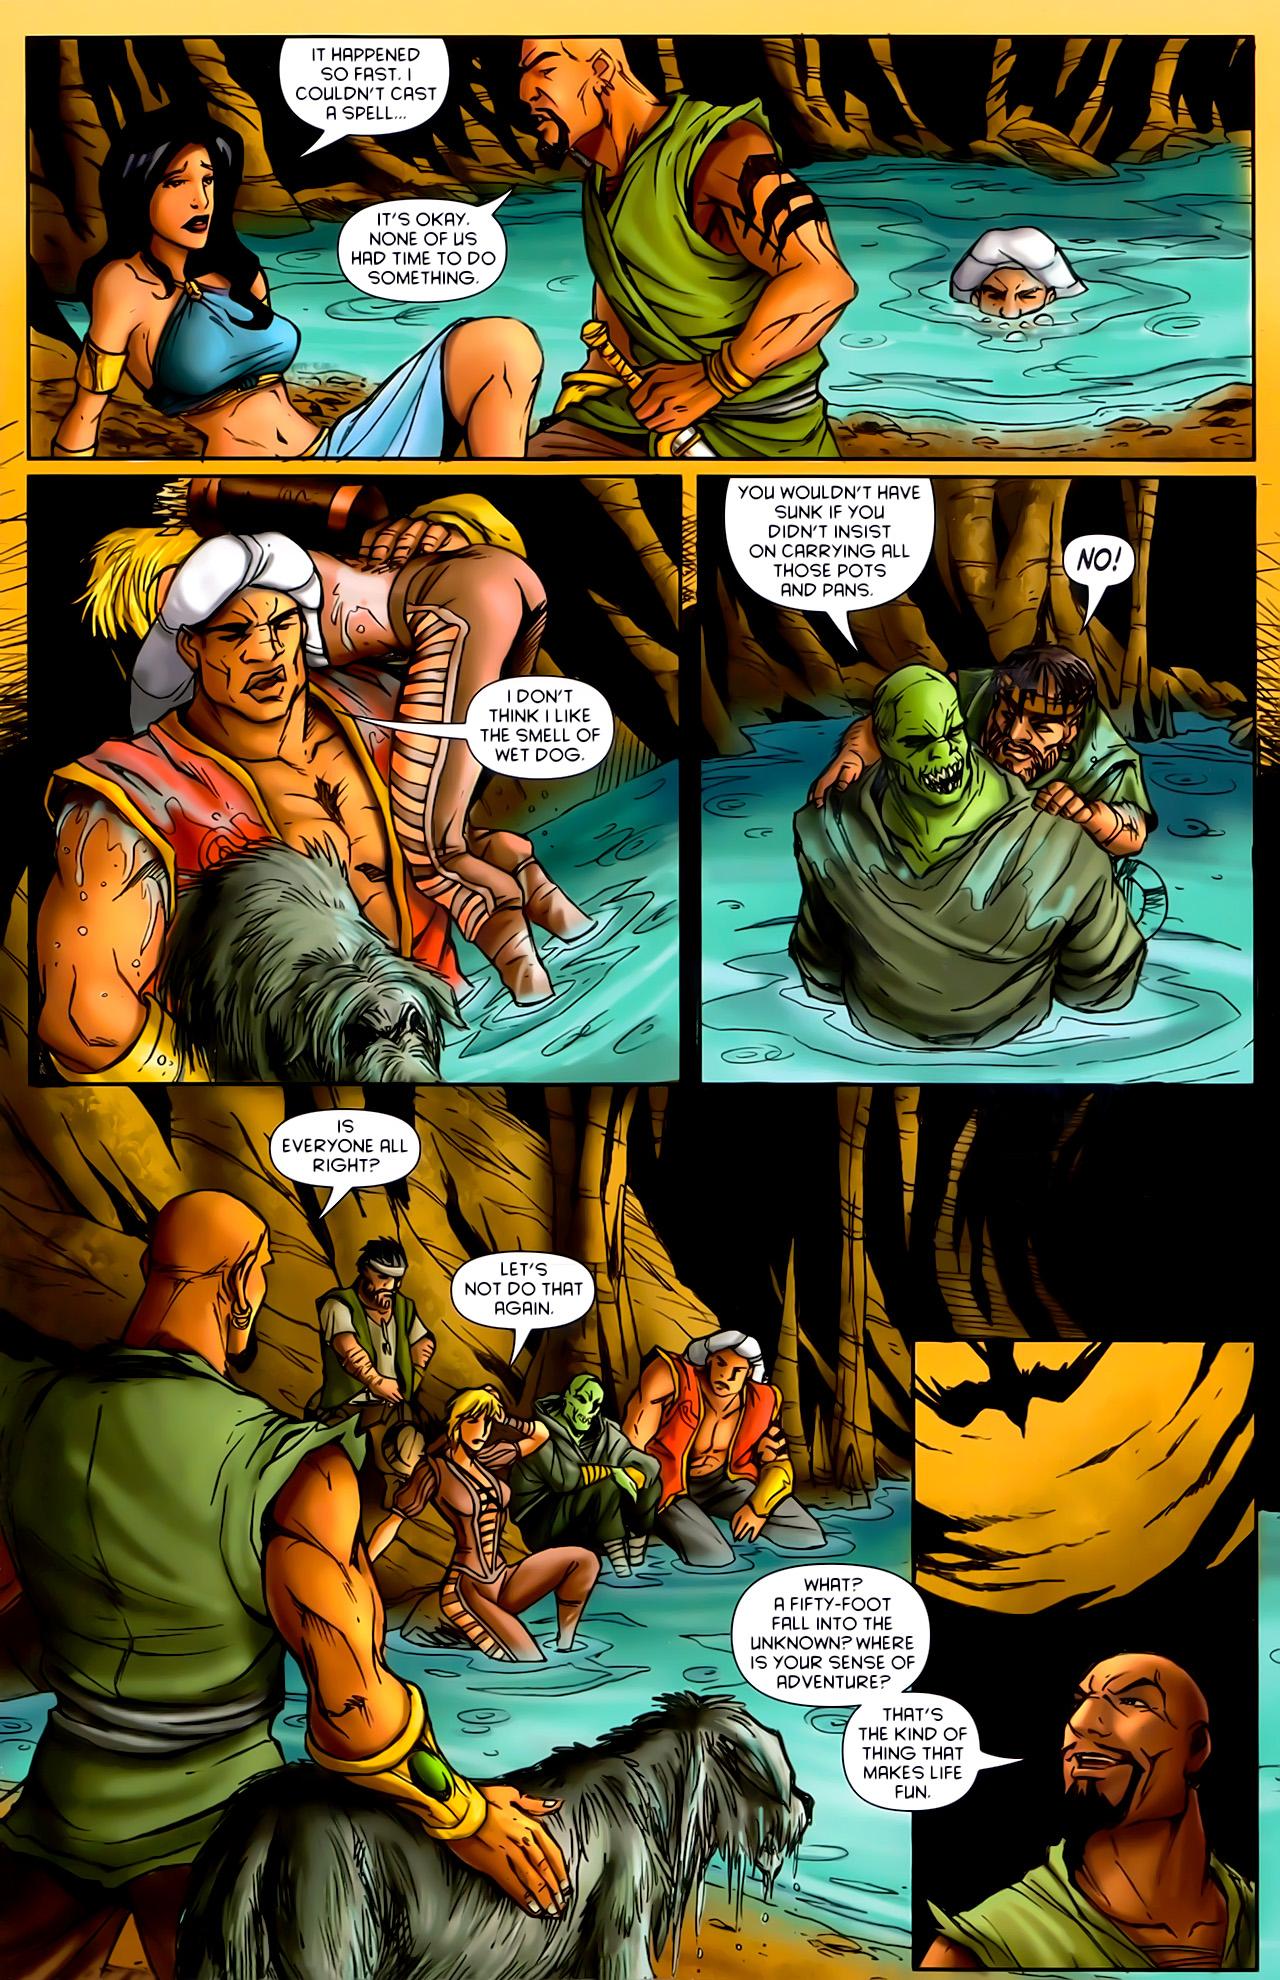 Read online 1001 Arabian Nights: The Adventures of Sinbad comic -  Issue #10 - 5